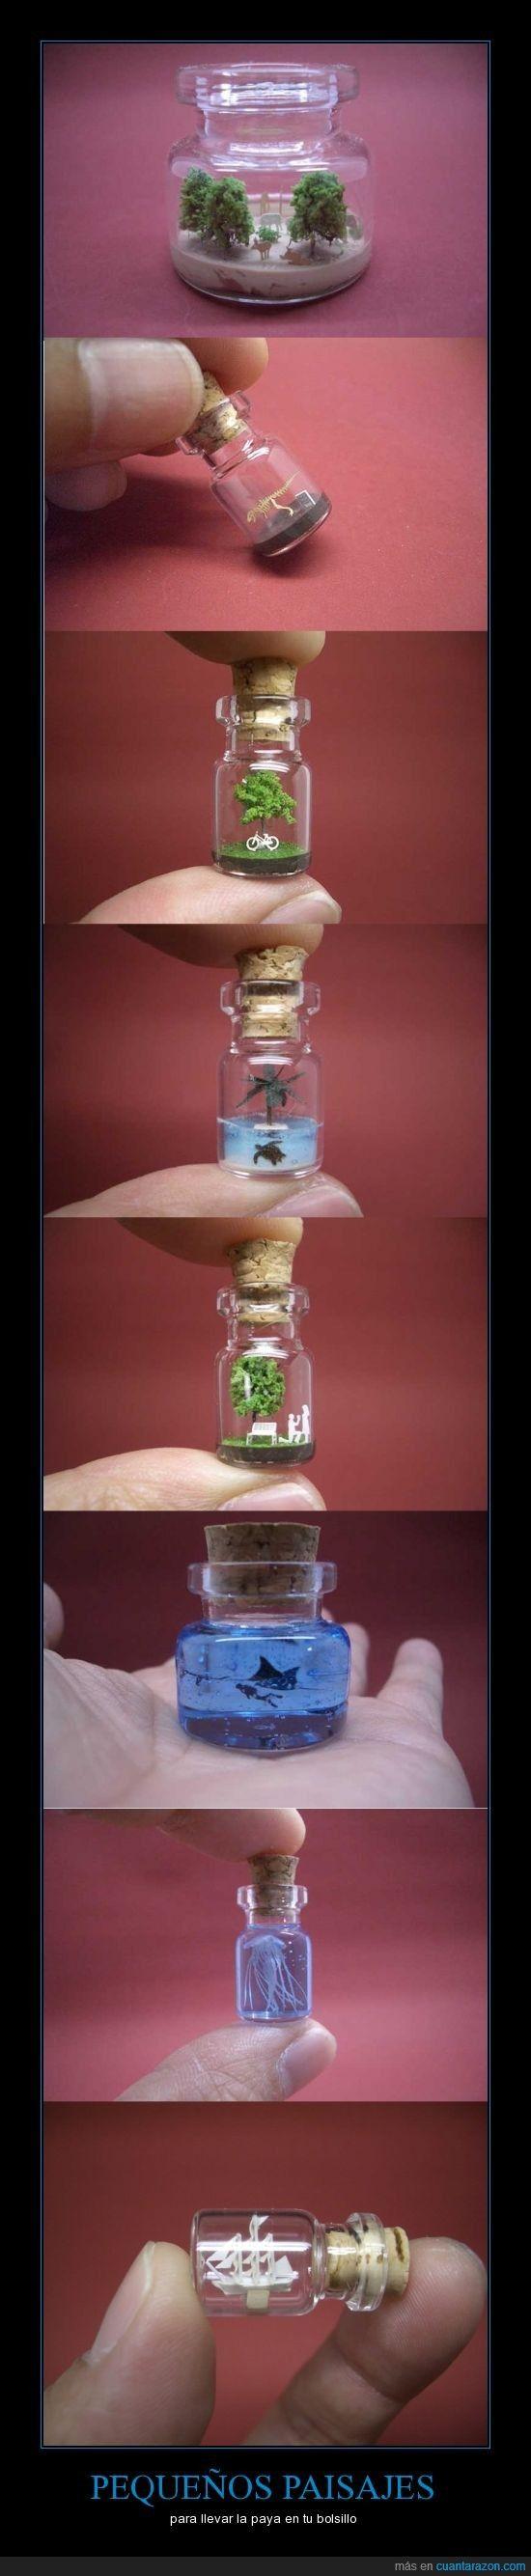 Arte en botellitas en miniatura - para llevar la paya en tu bolsillo